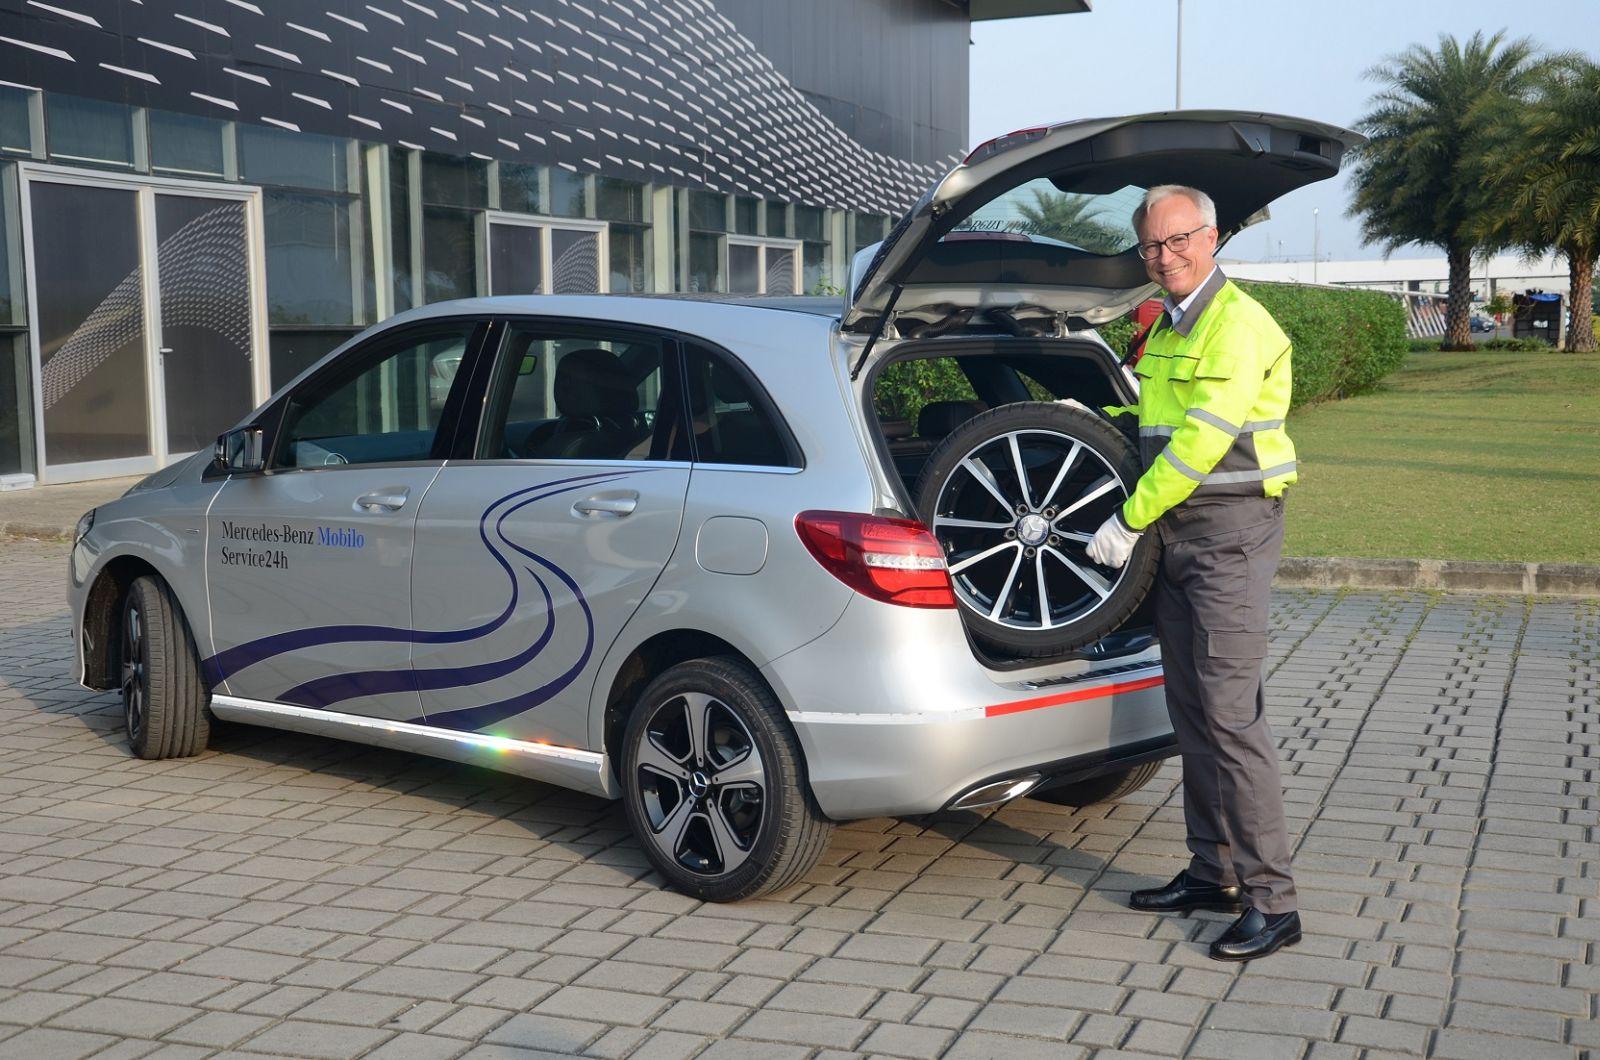 Mercedes benz india launches mobilo a 24x7 customer for Mercedes benz roadside service